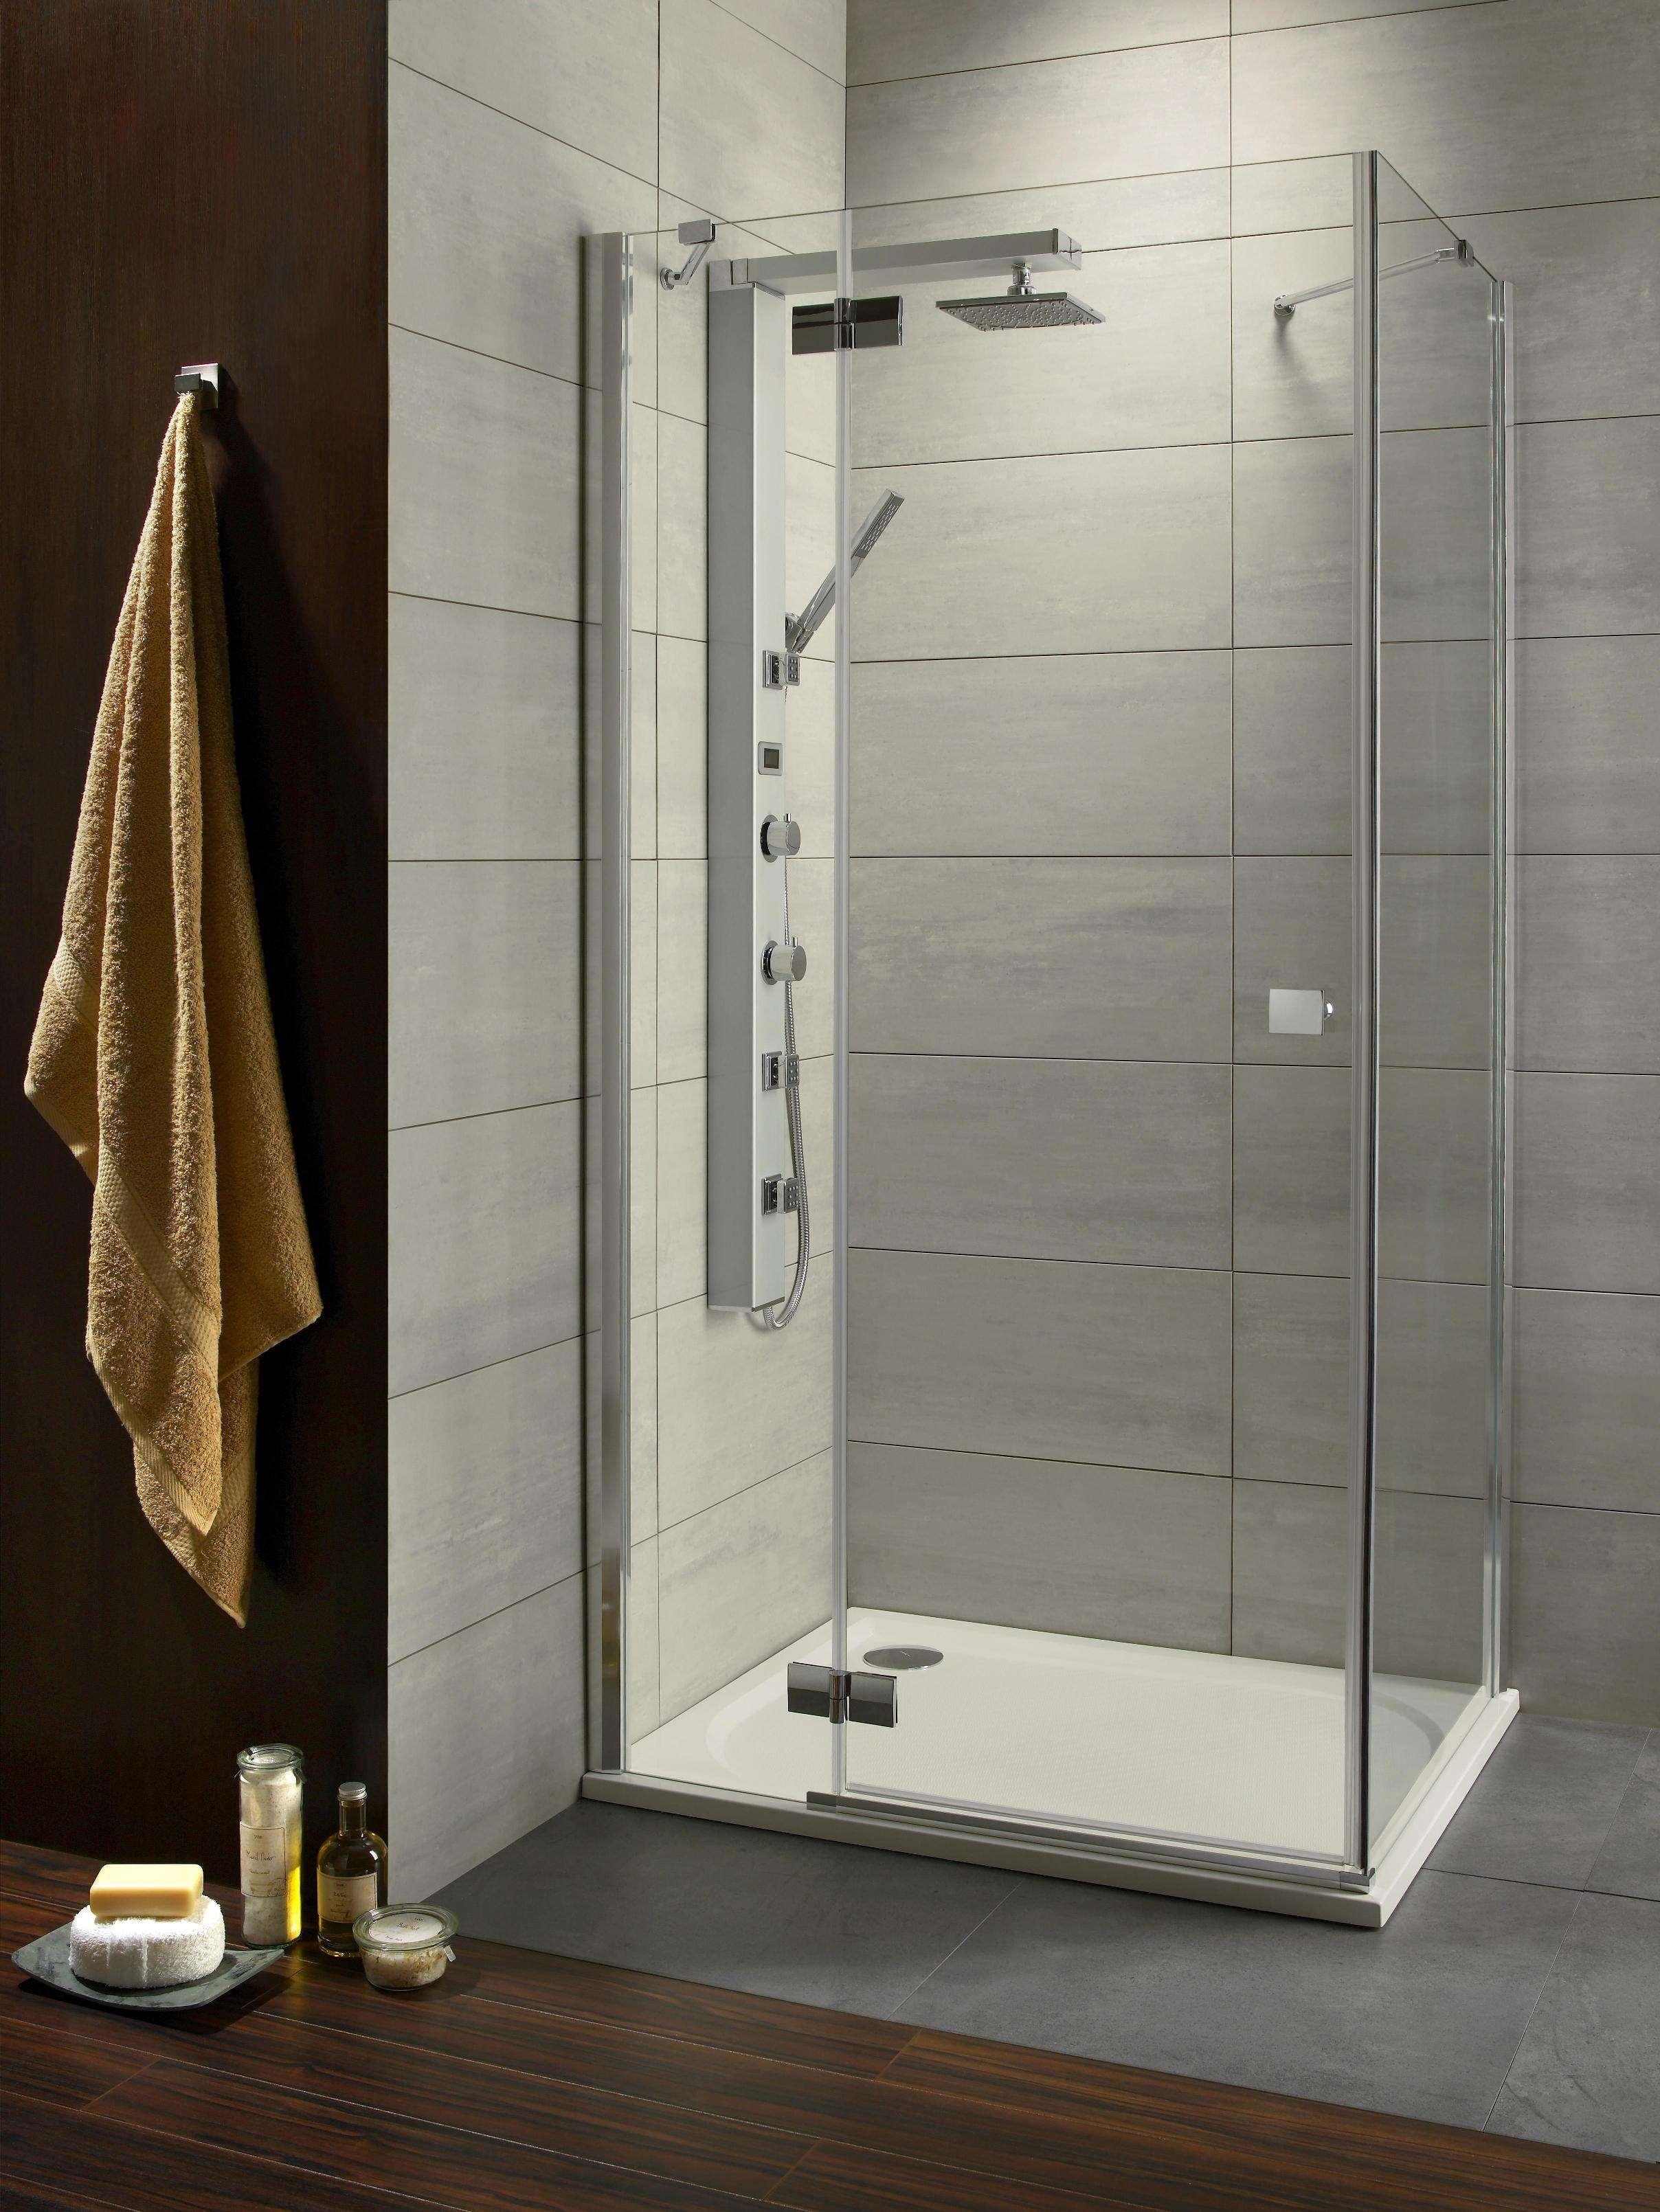 kabiny prysznicowe Excellent